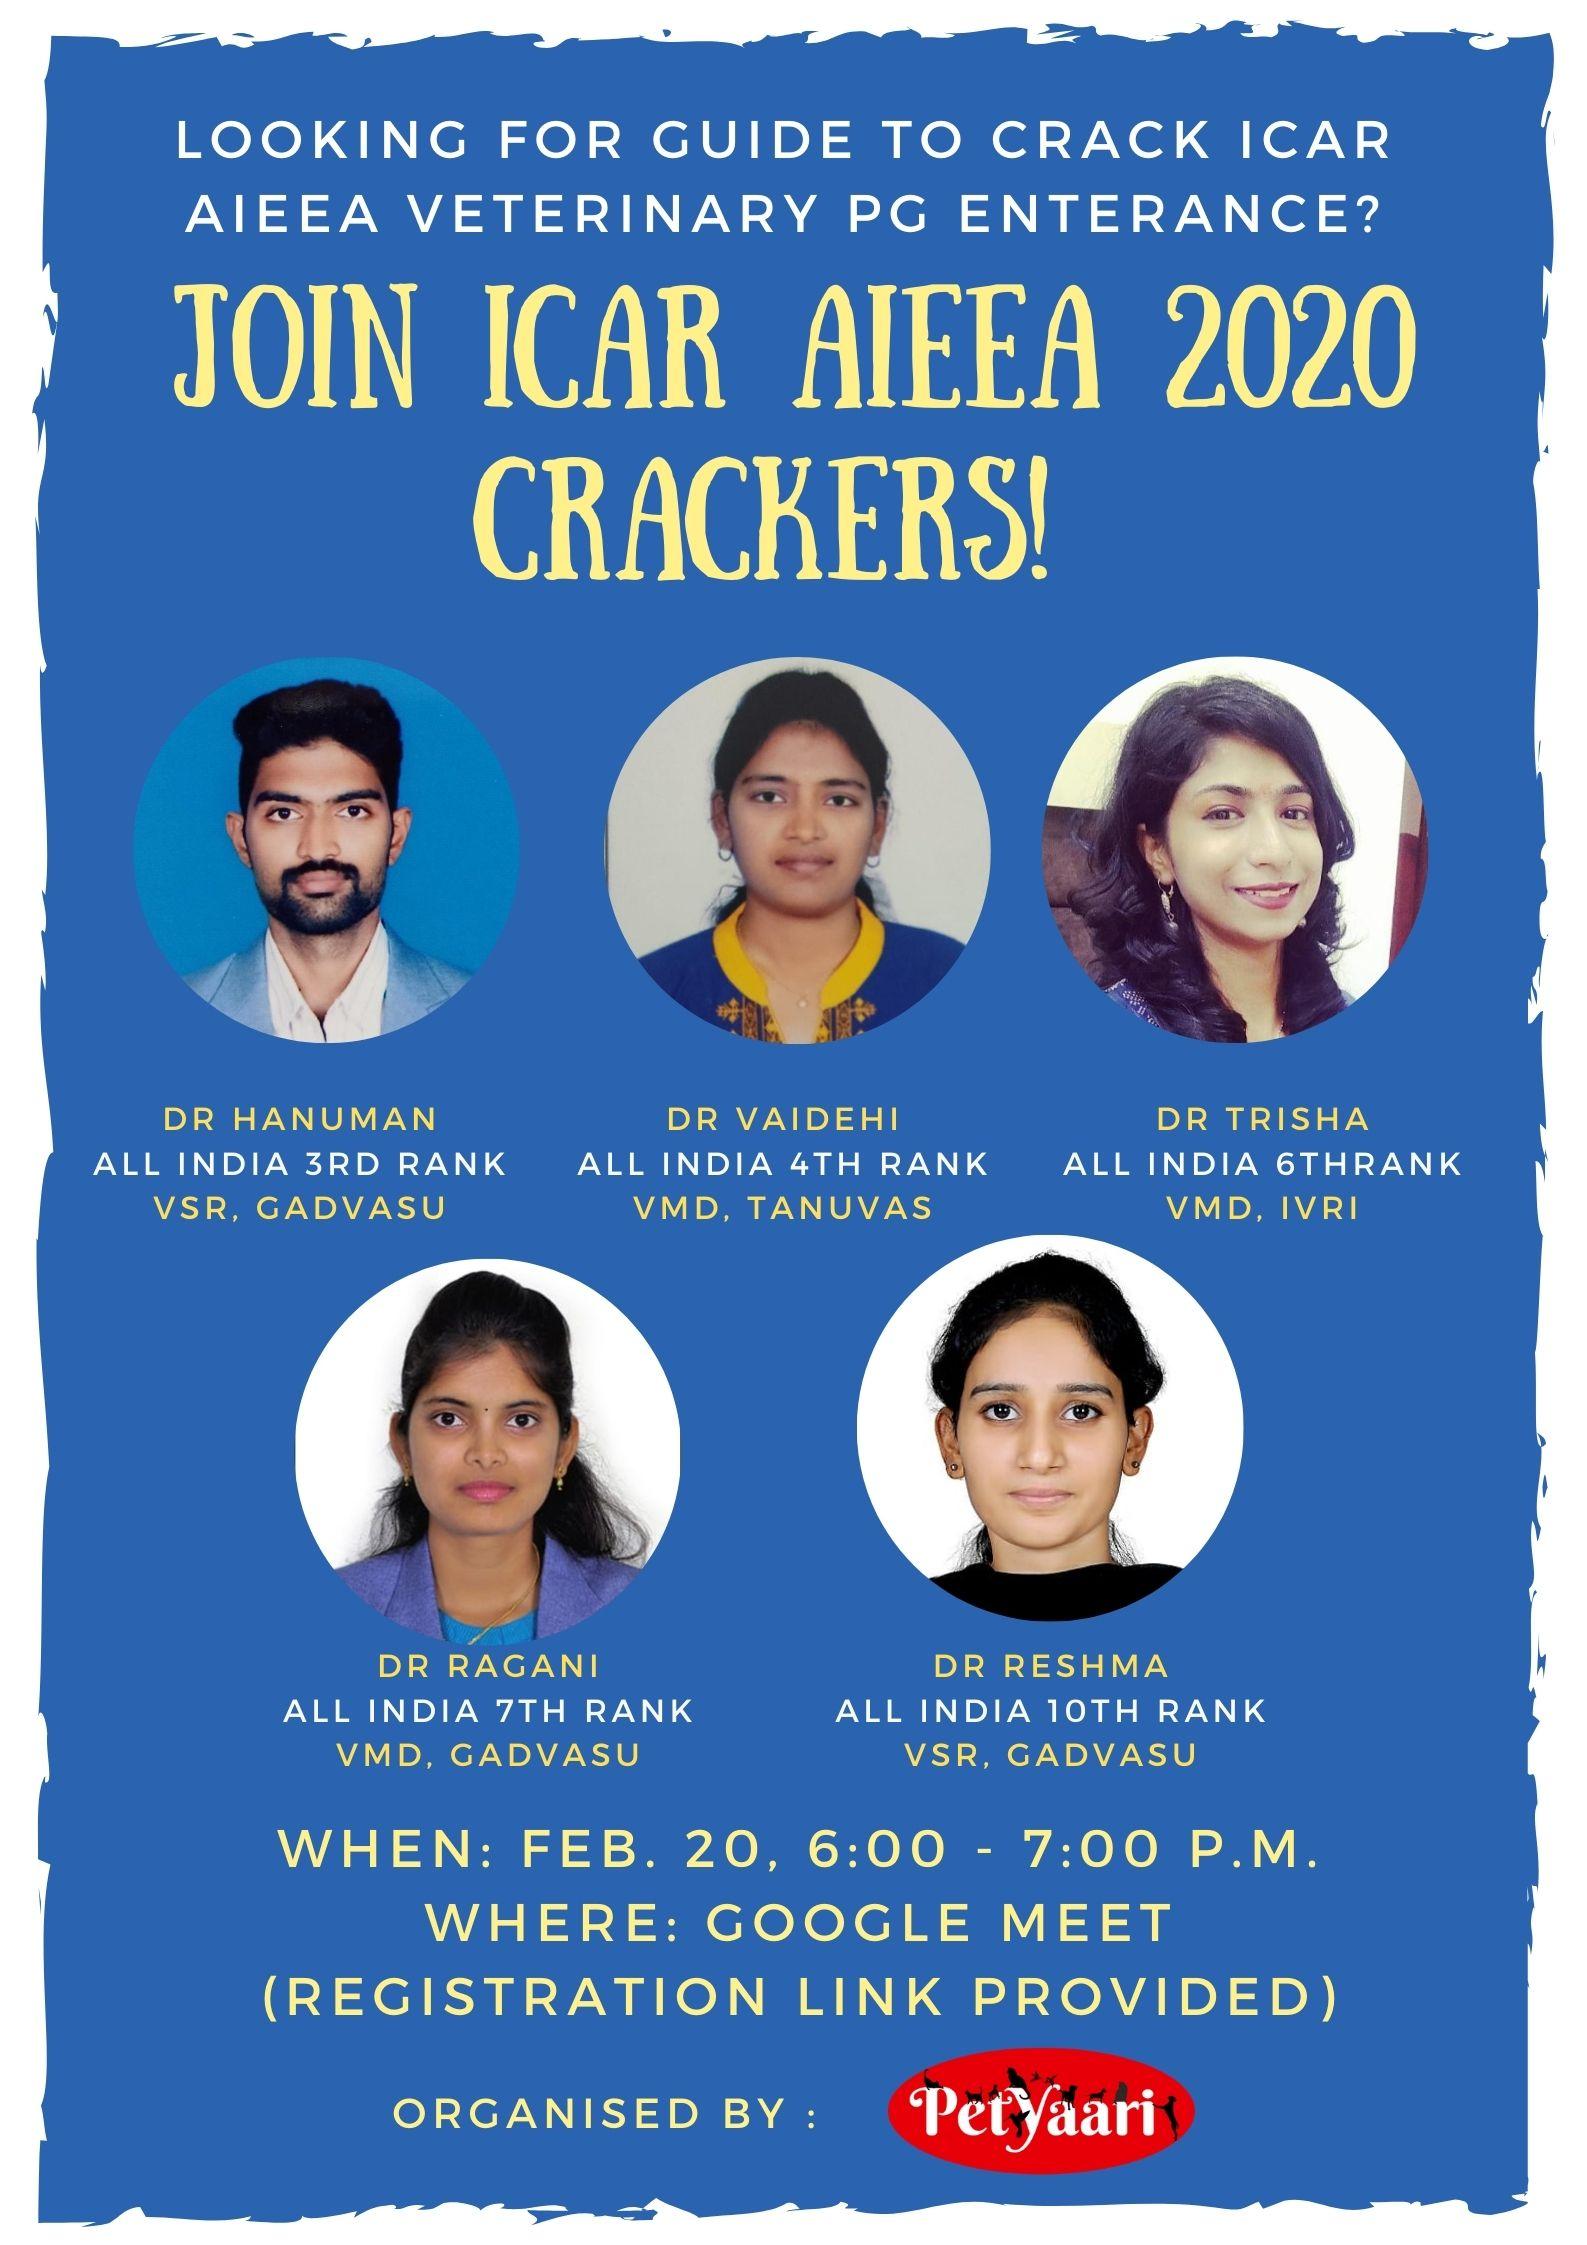 Final icar poster 1 • Join ICAR AIEEA 2020 Crackers